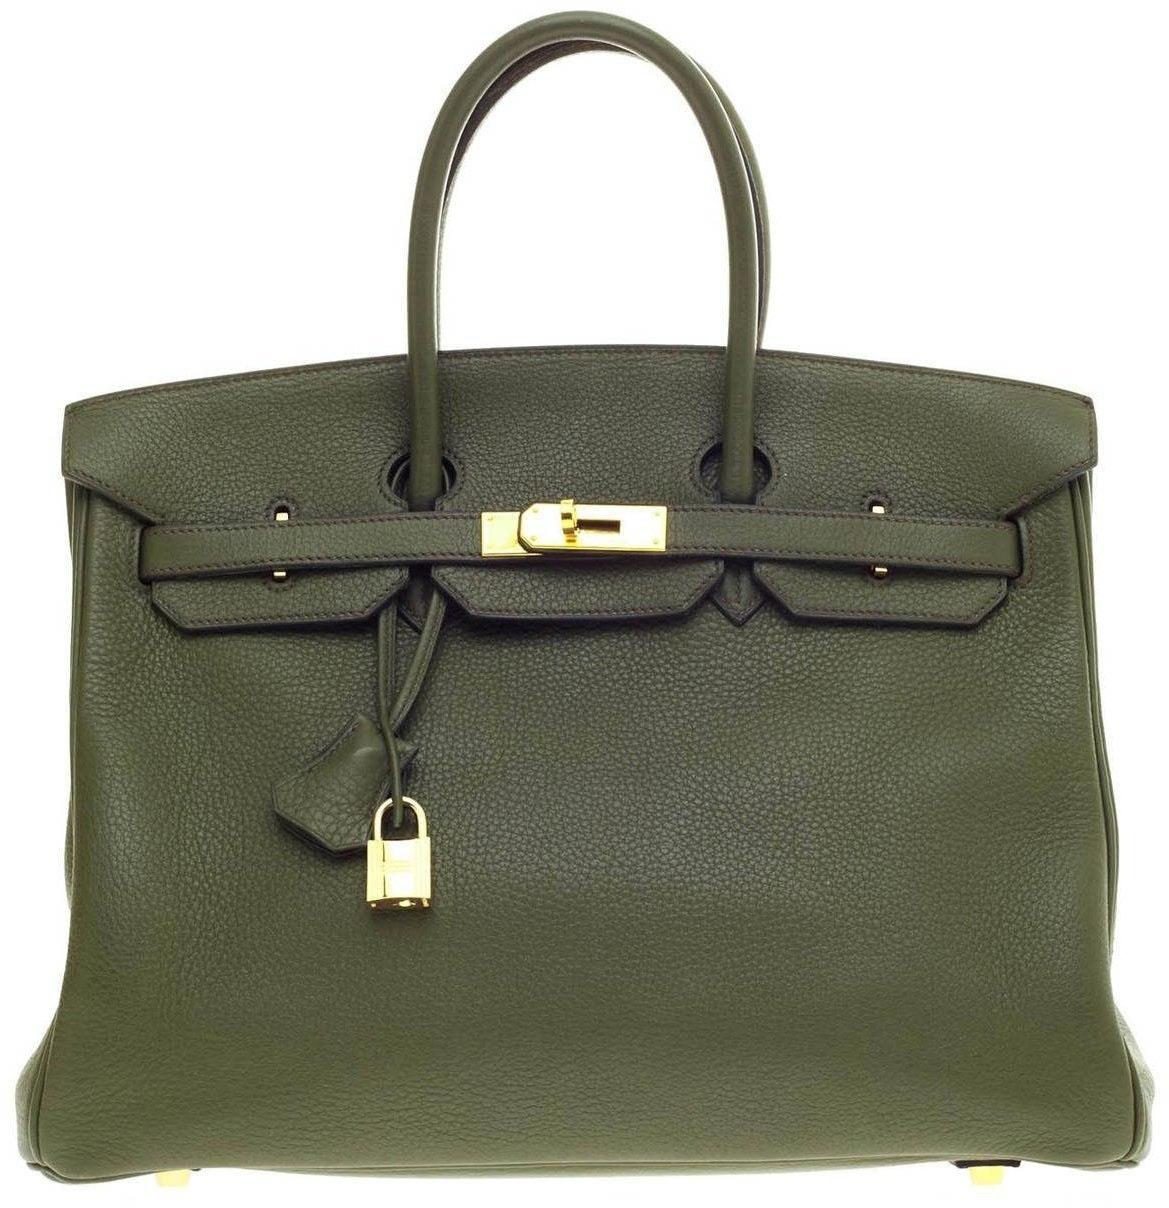 Hermes Birkin Togo 35 Vert Olive